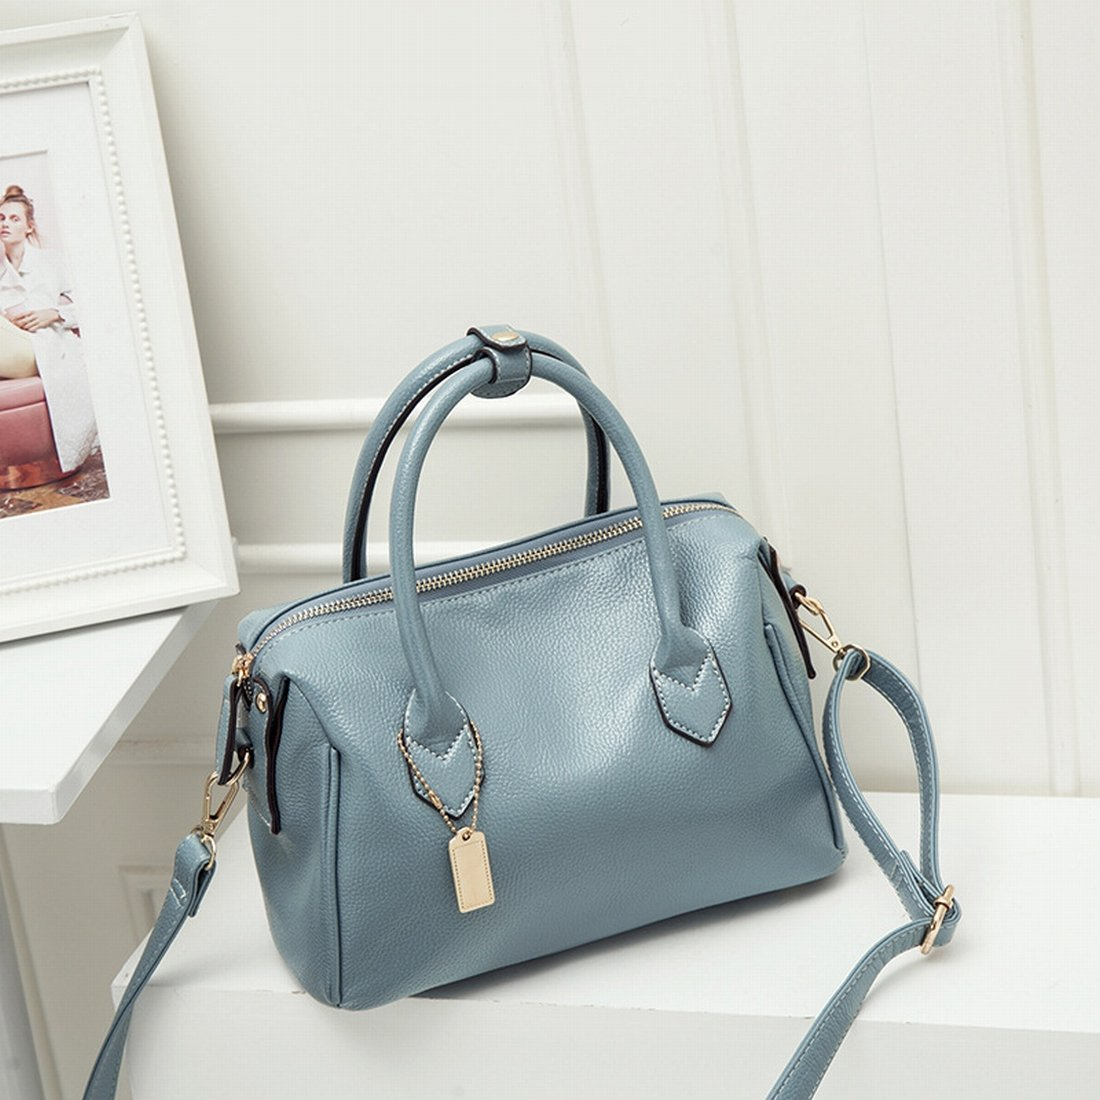 Frauen Retro Ladies Ladies Handy schräg Fashion Boston Big Bag